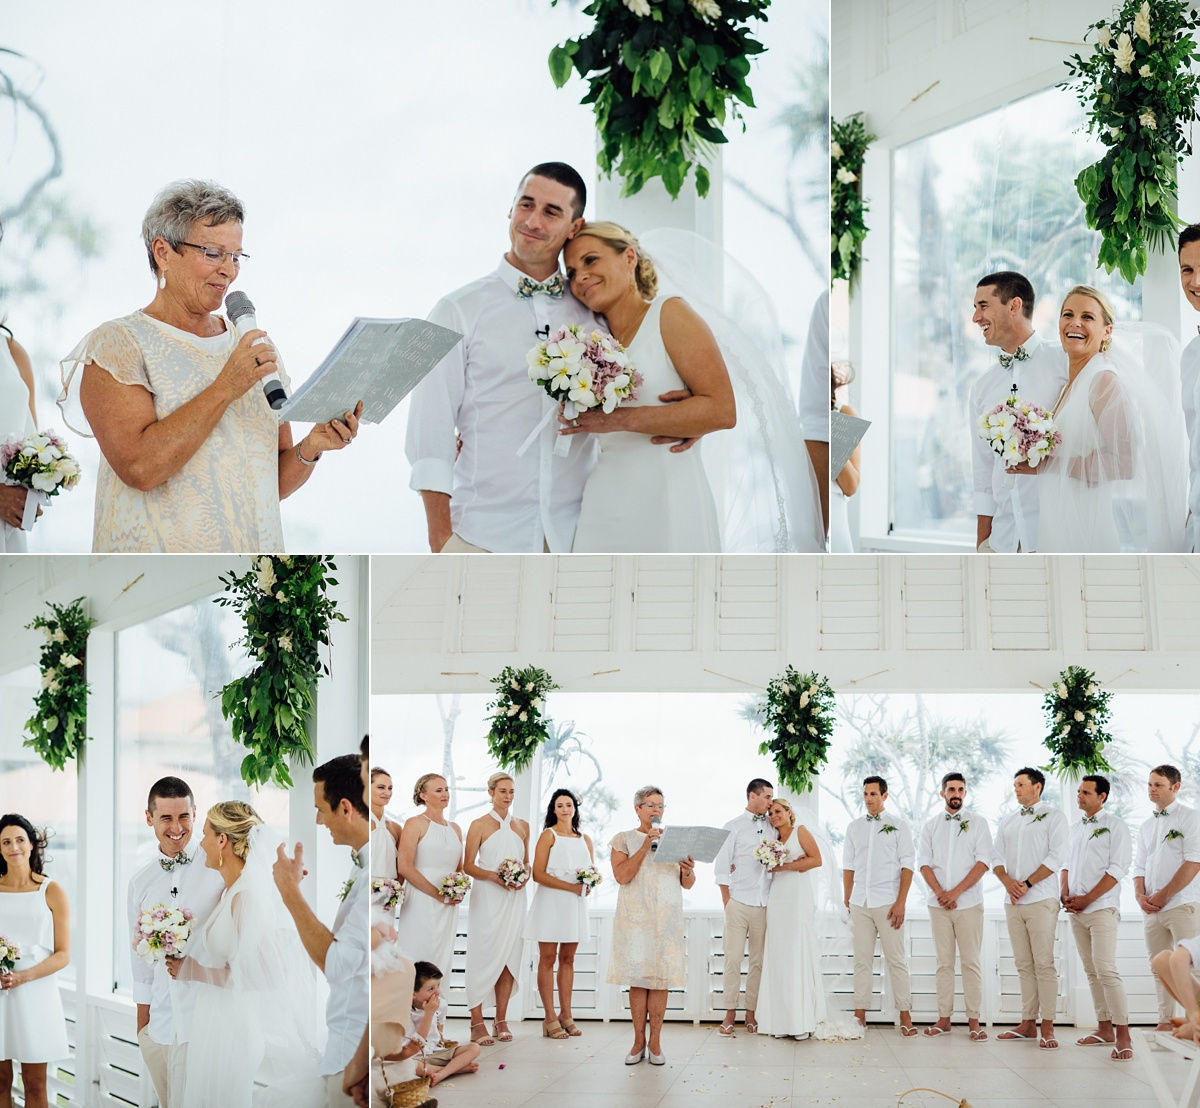 mark-kate-wedding-tamanu-vanuatu-groovy-banana-27.jpg